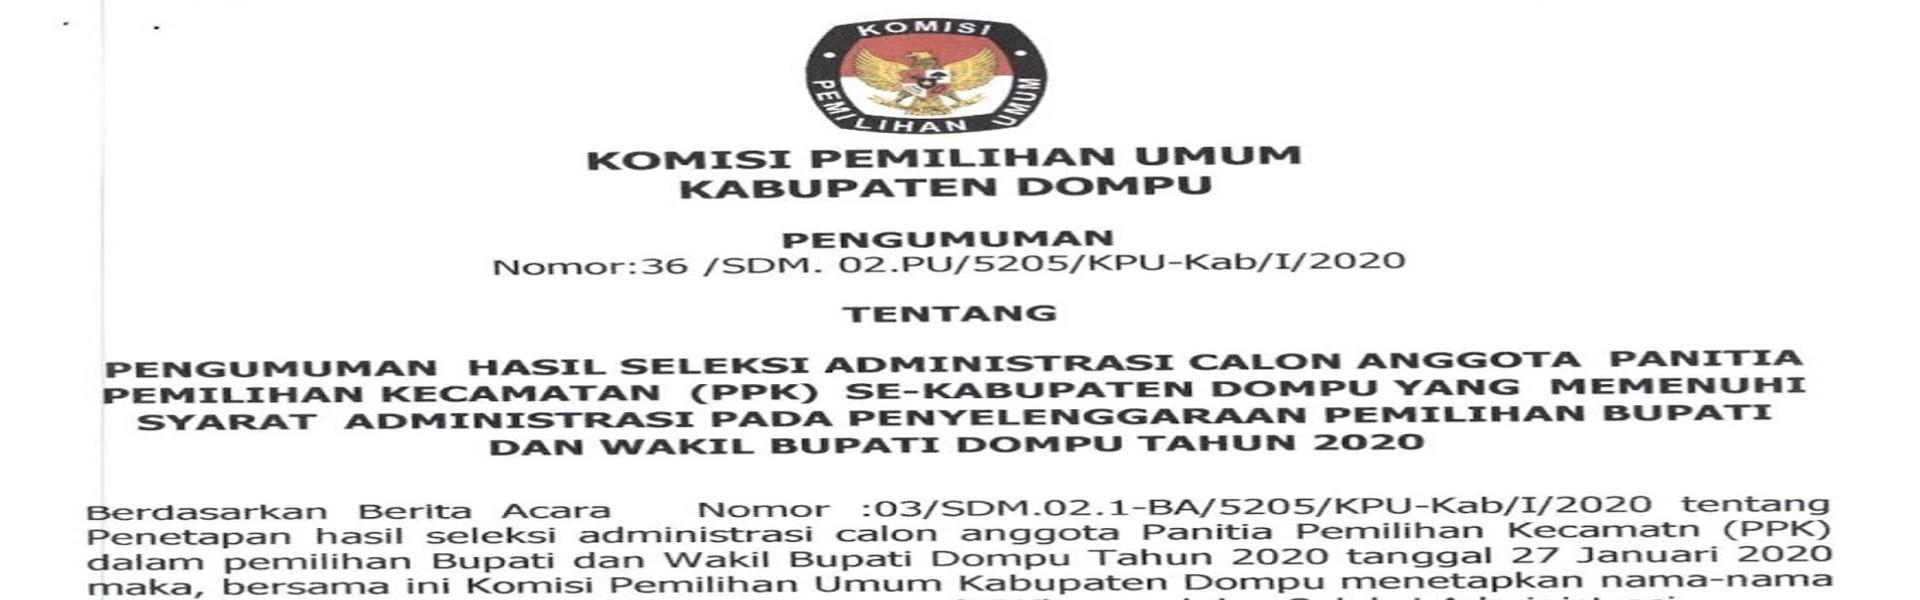 Hasil Seleksi Administrasi Calon Anggota PPK Se-Kabupaten Dompu